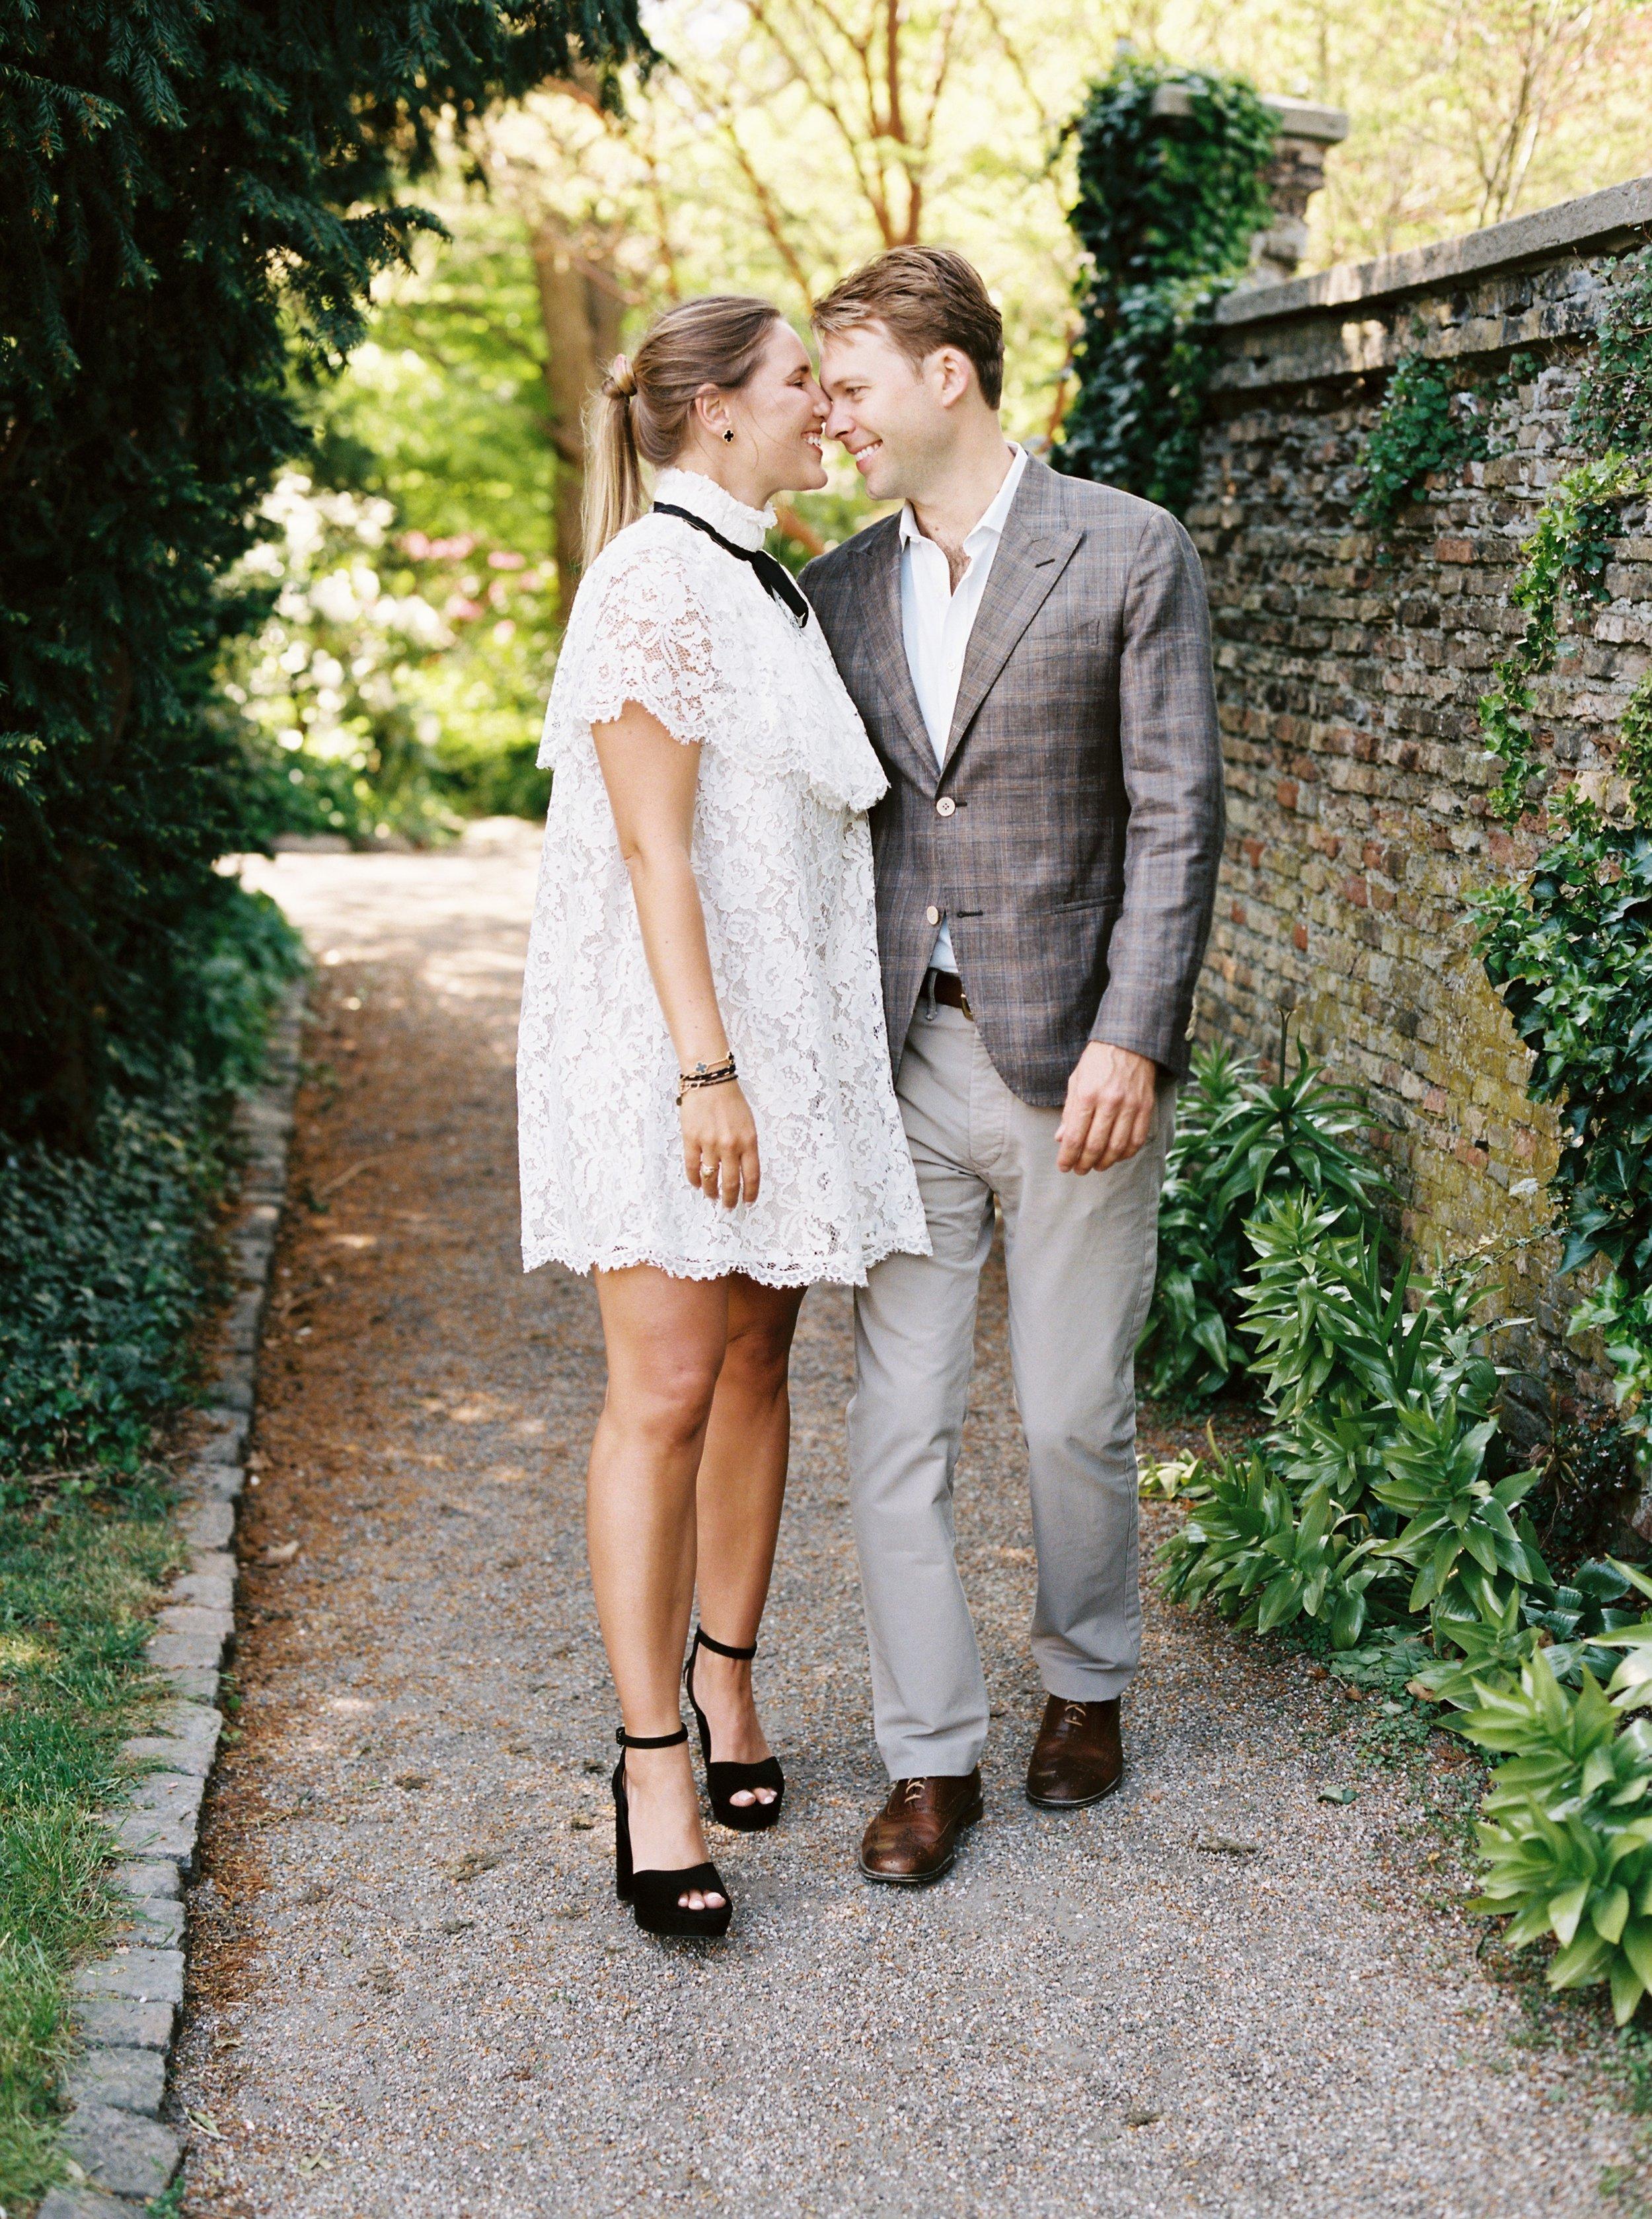 Kyle John l Fine Art Wedding Photography l Chicago, Copenhagen, California, New York, Destination l Blog l Alexis and Zach_Copenhagen Part 1_10